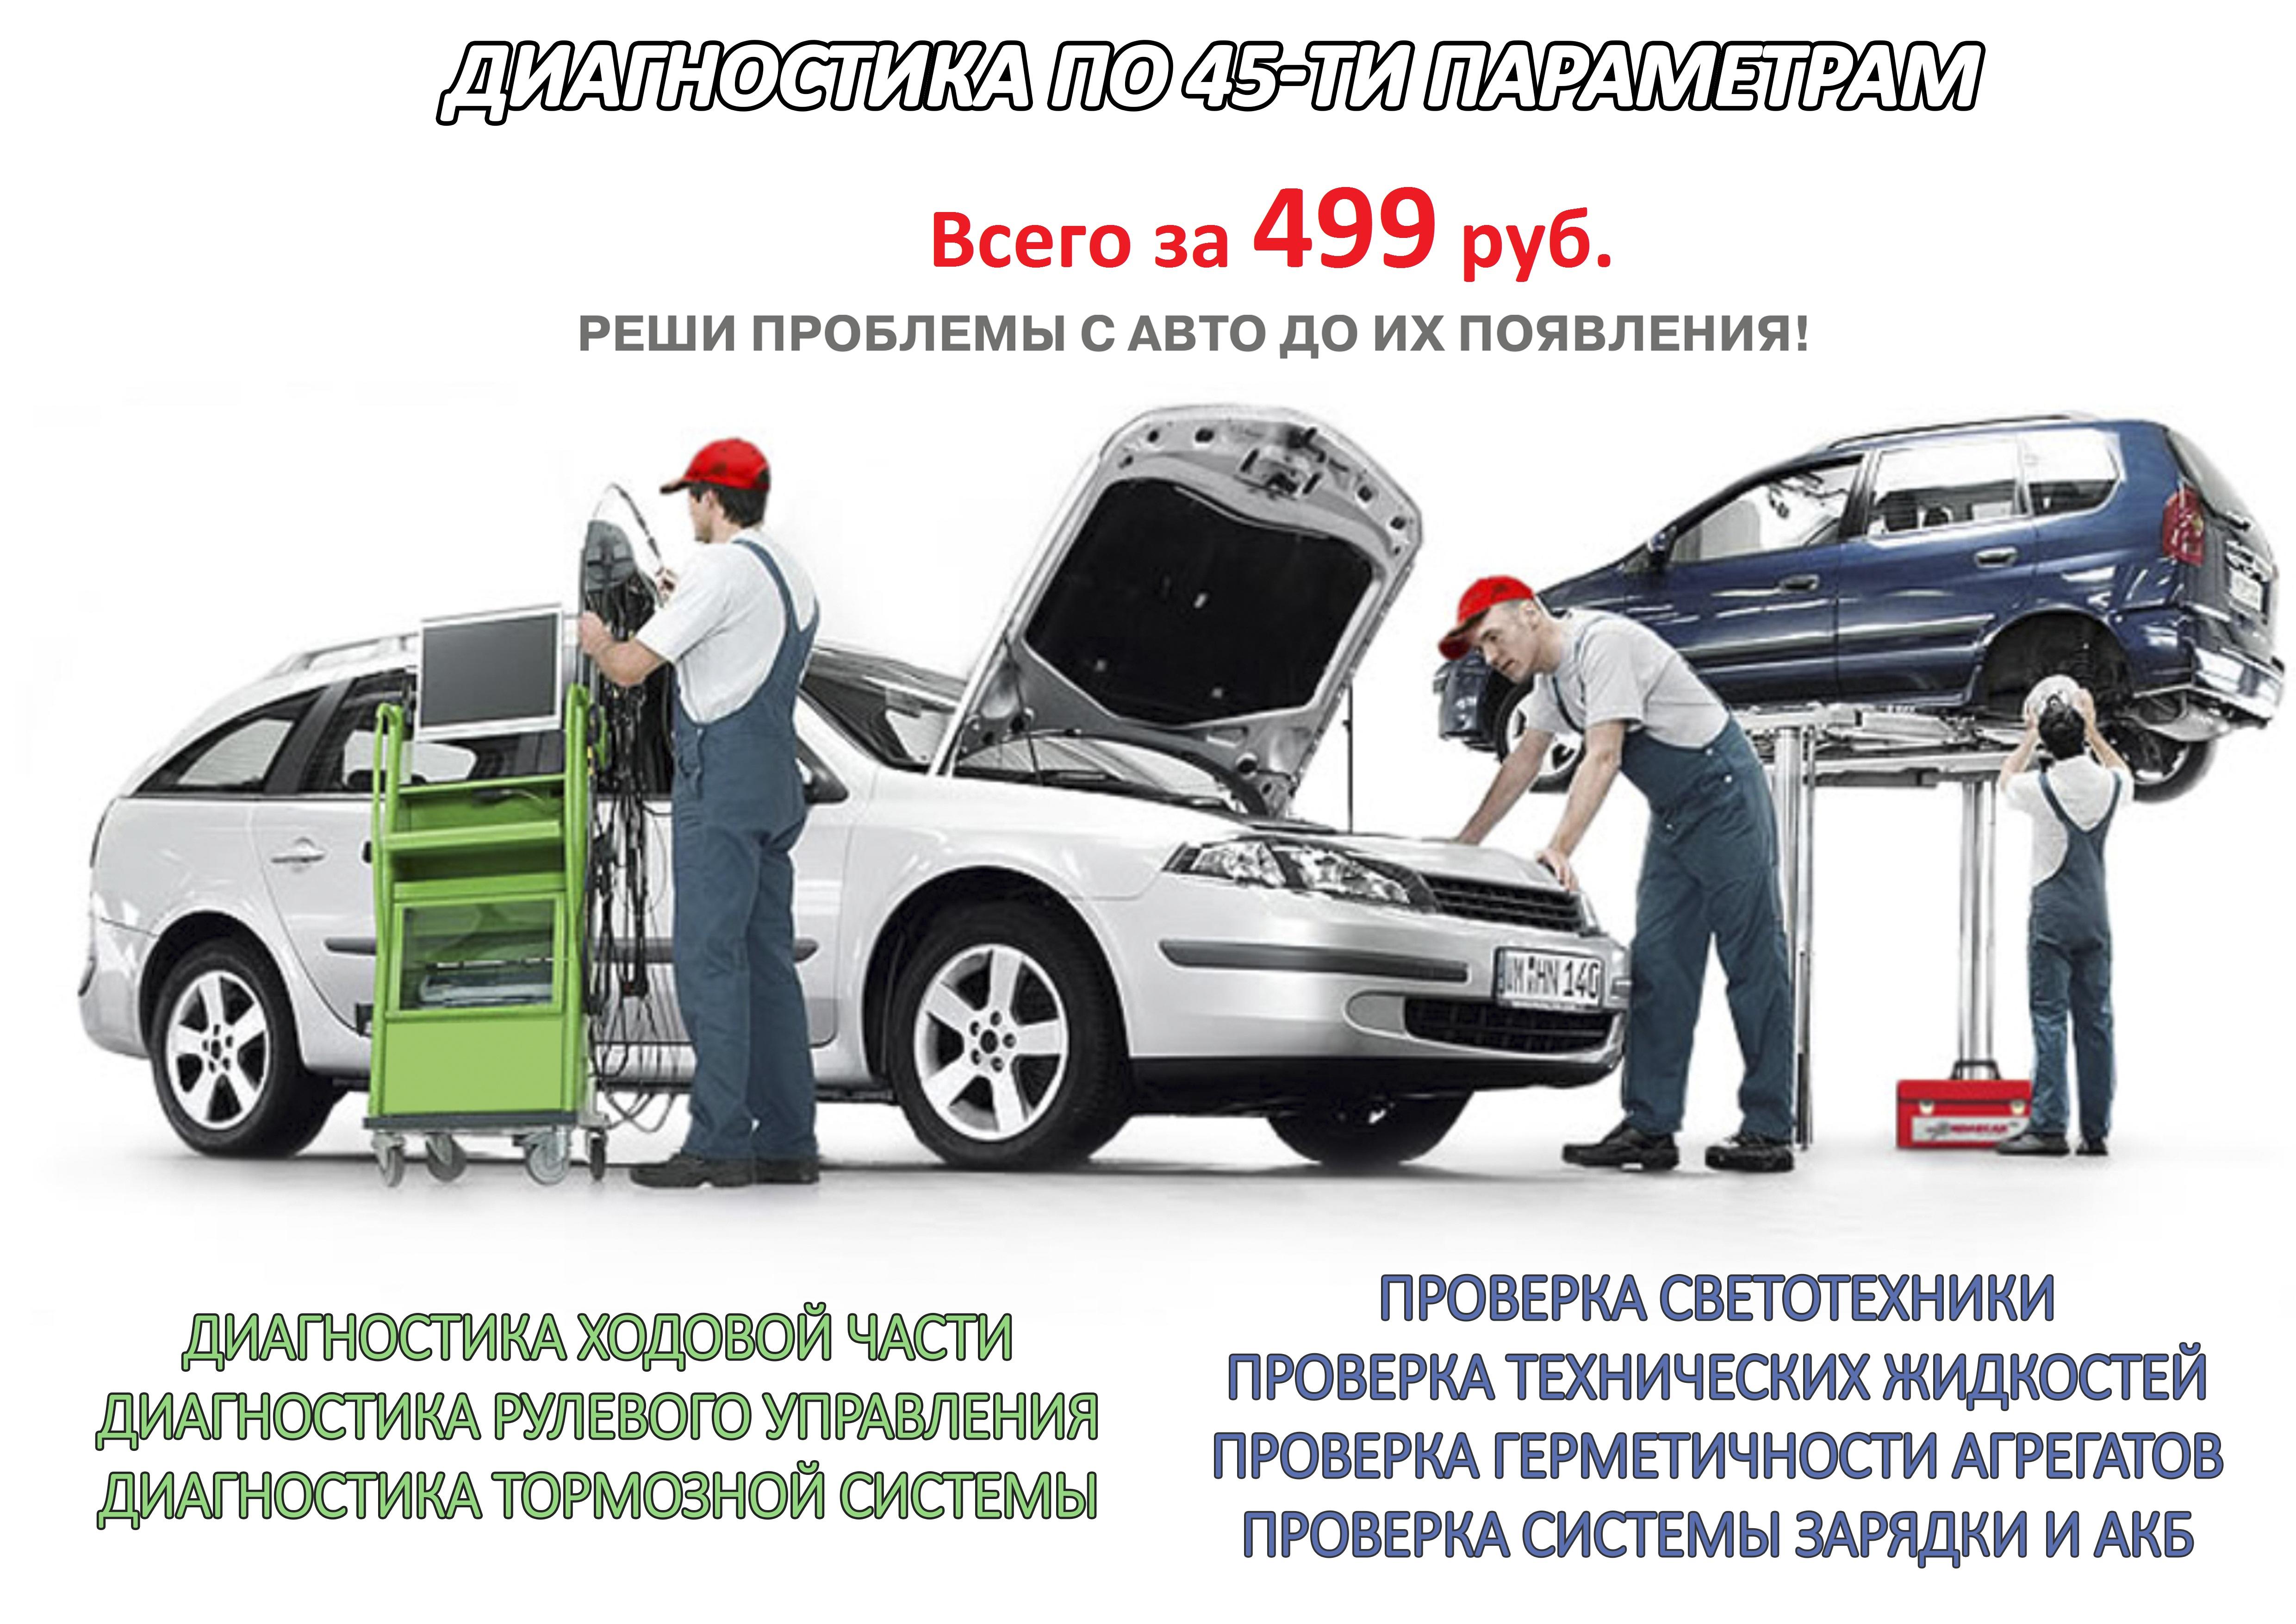 45 параметров за 499 рублей